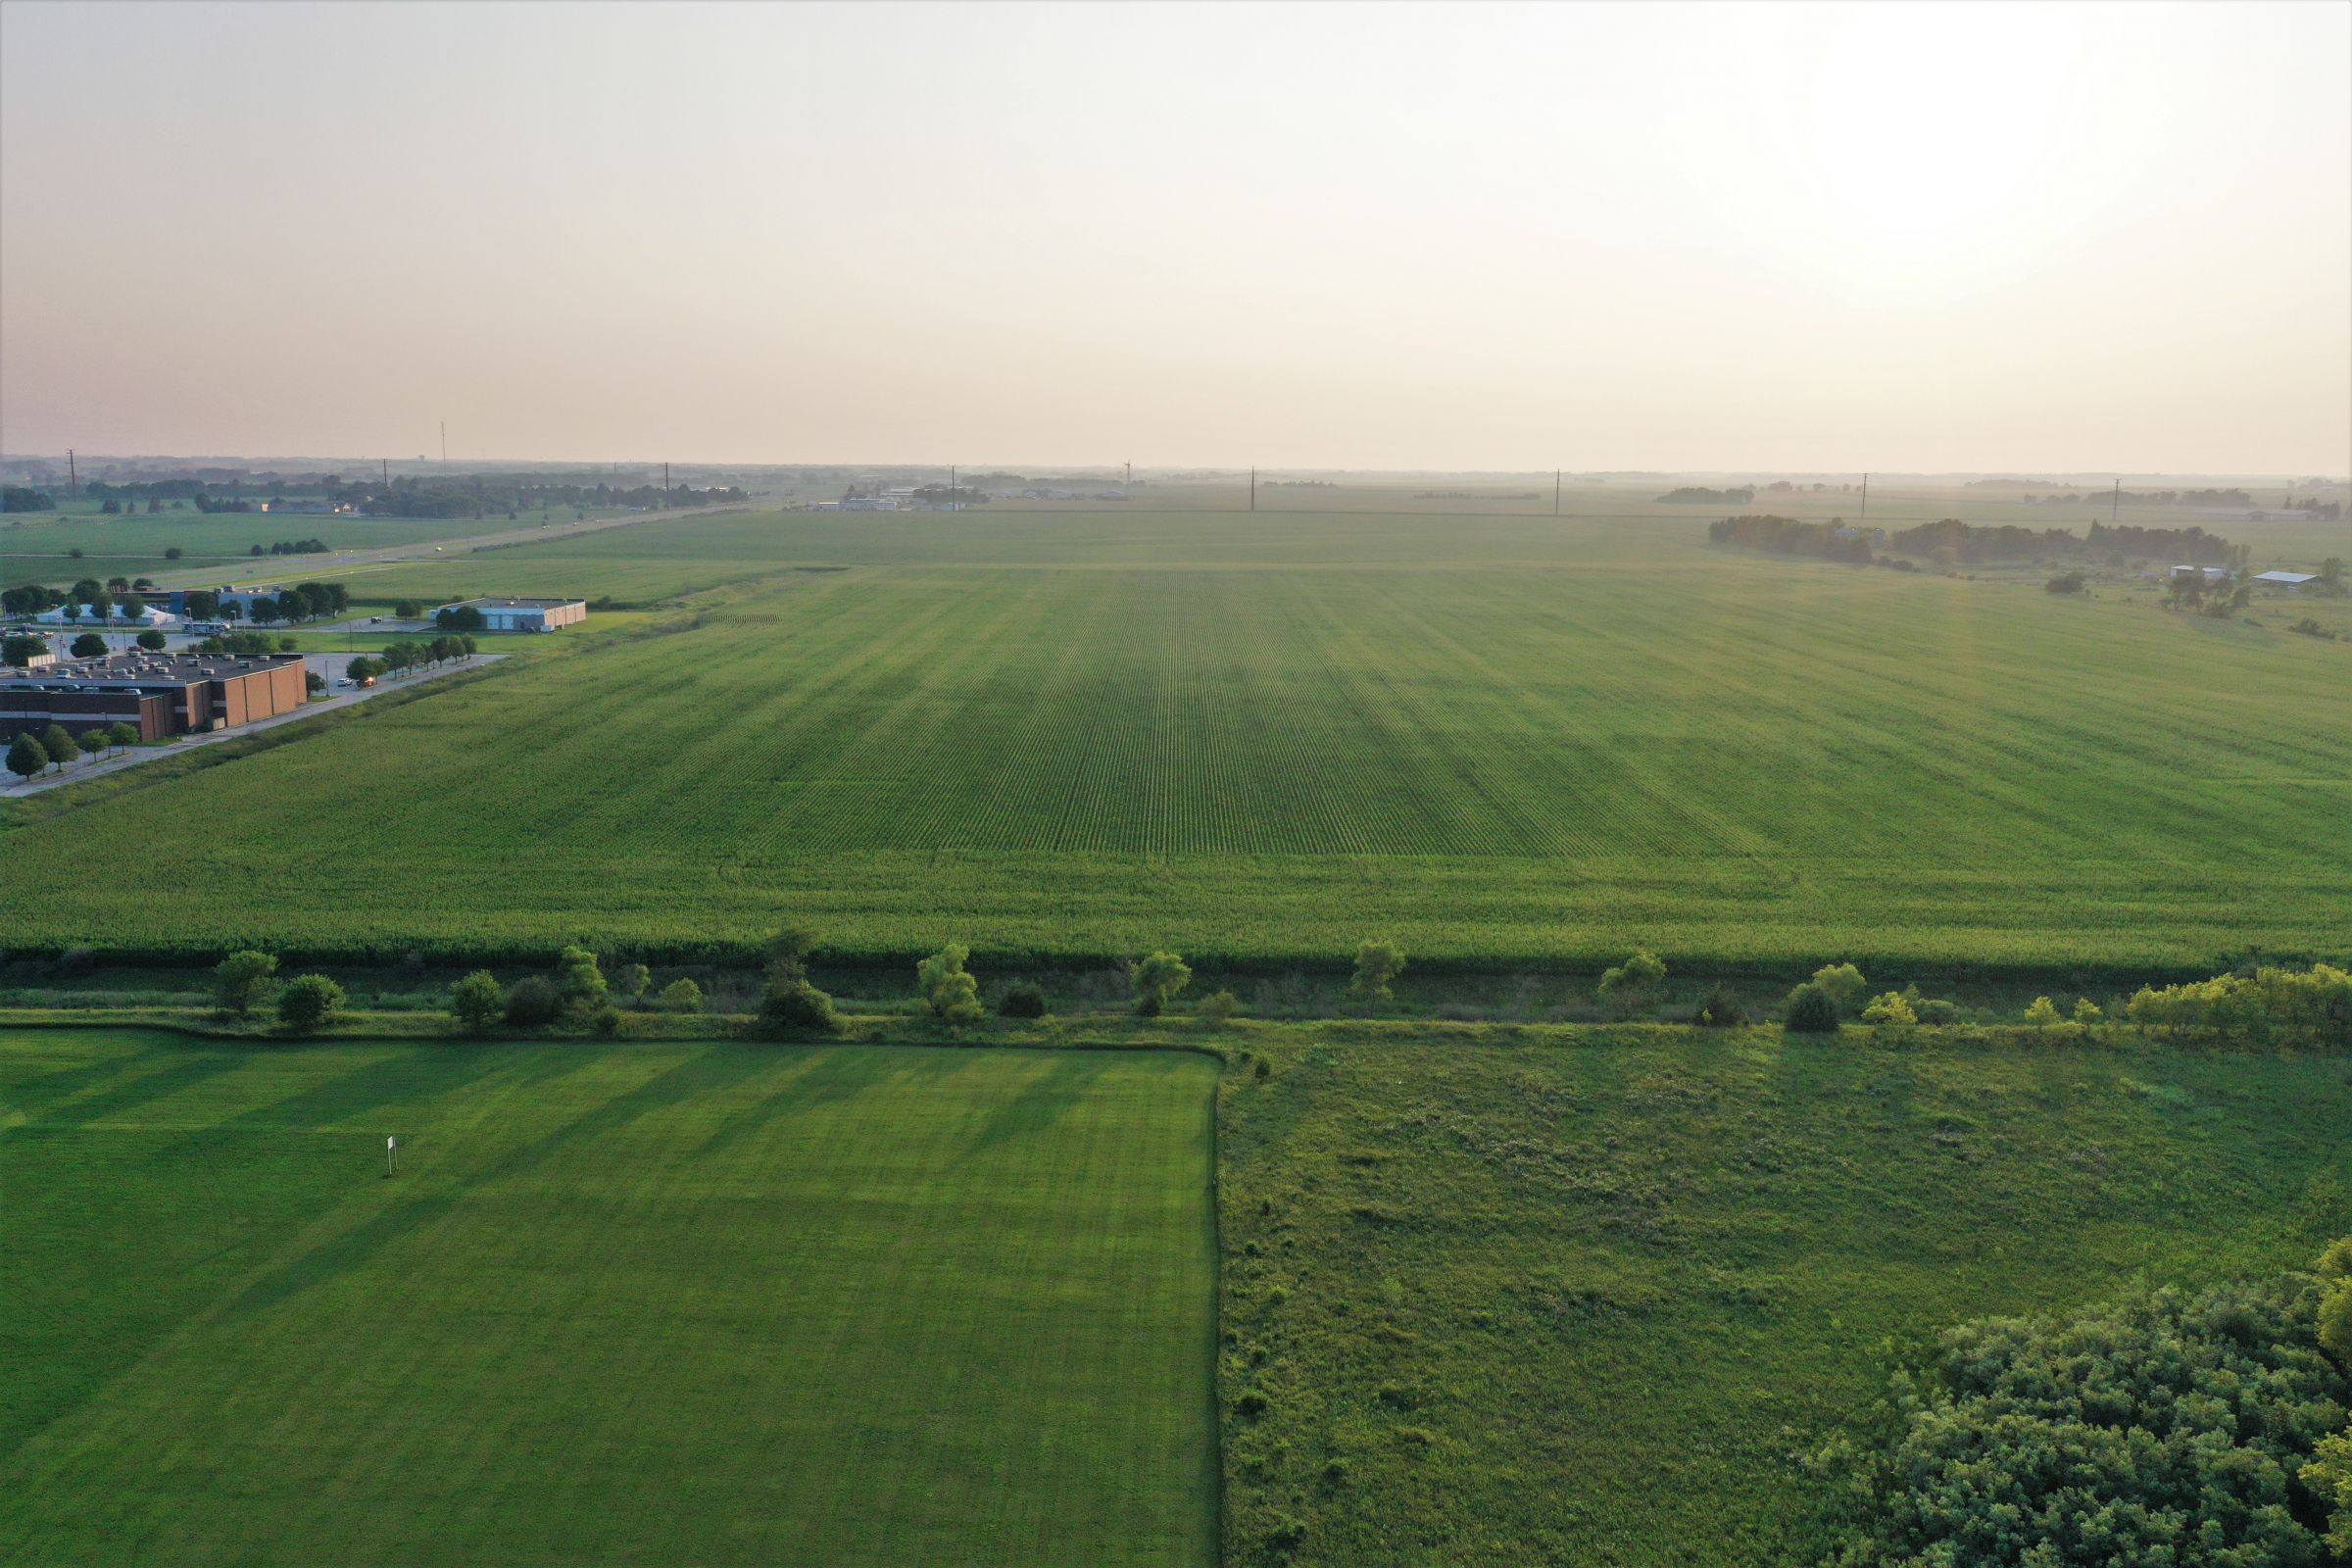 development-land-commercial-cerro-gordo-county-iowa-108-acres-listing-number-15644-2-2021-07-19-140720.jpg